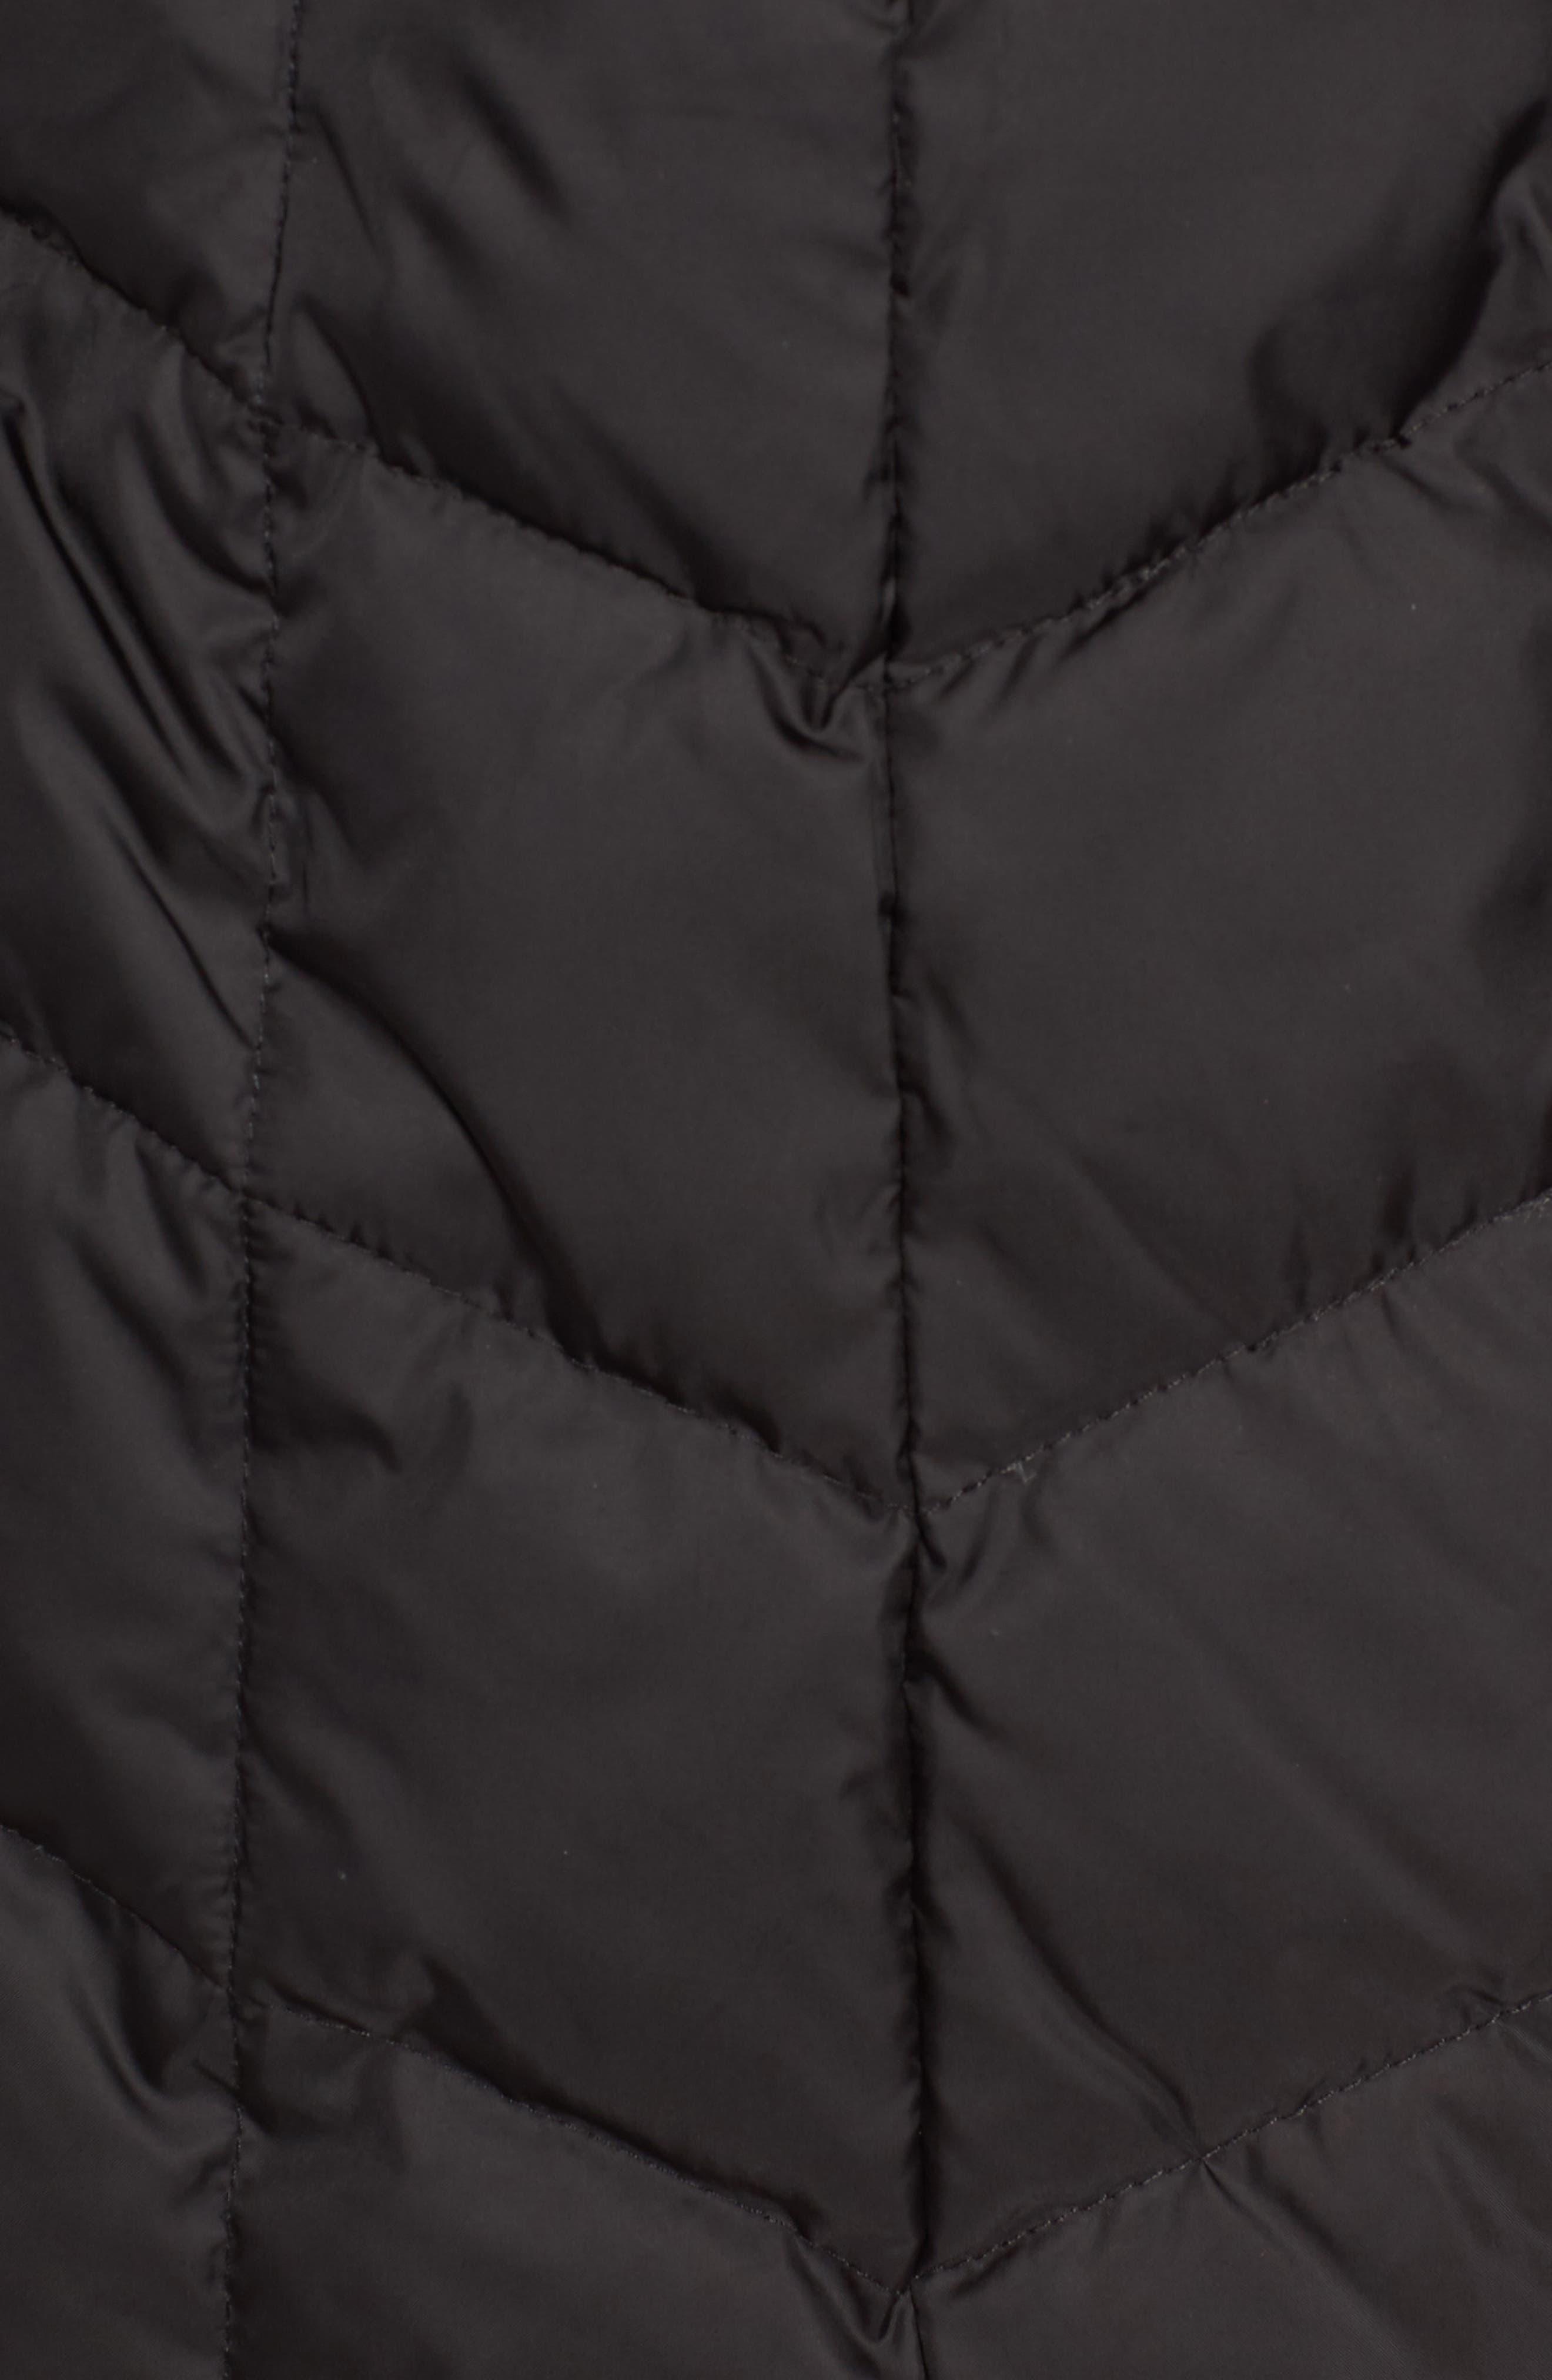 Marley 30 Coat with Detachable Faux Fur,                             Alternate thumbnail 6, color,                             001